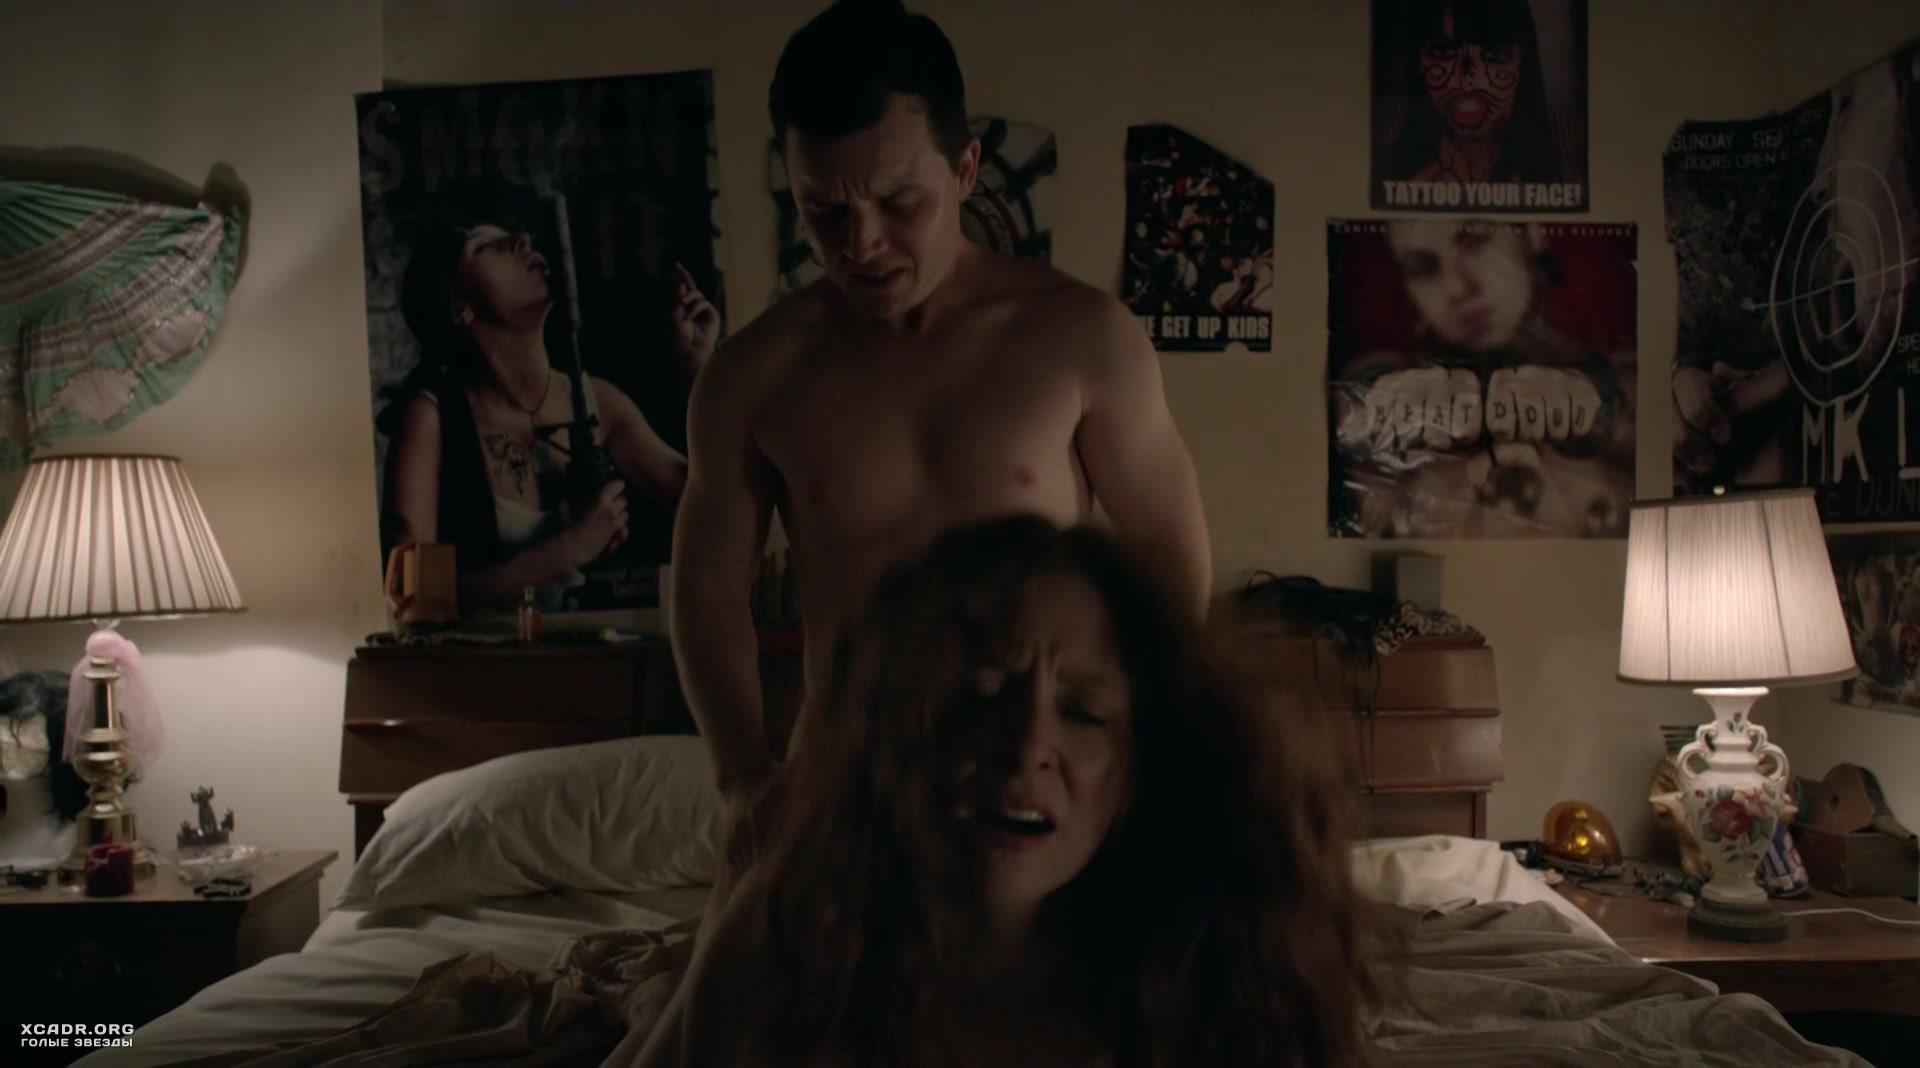 Кейт бекинсейл секс сцены онлайн